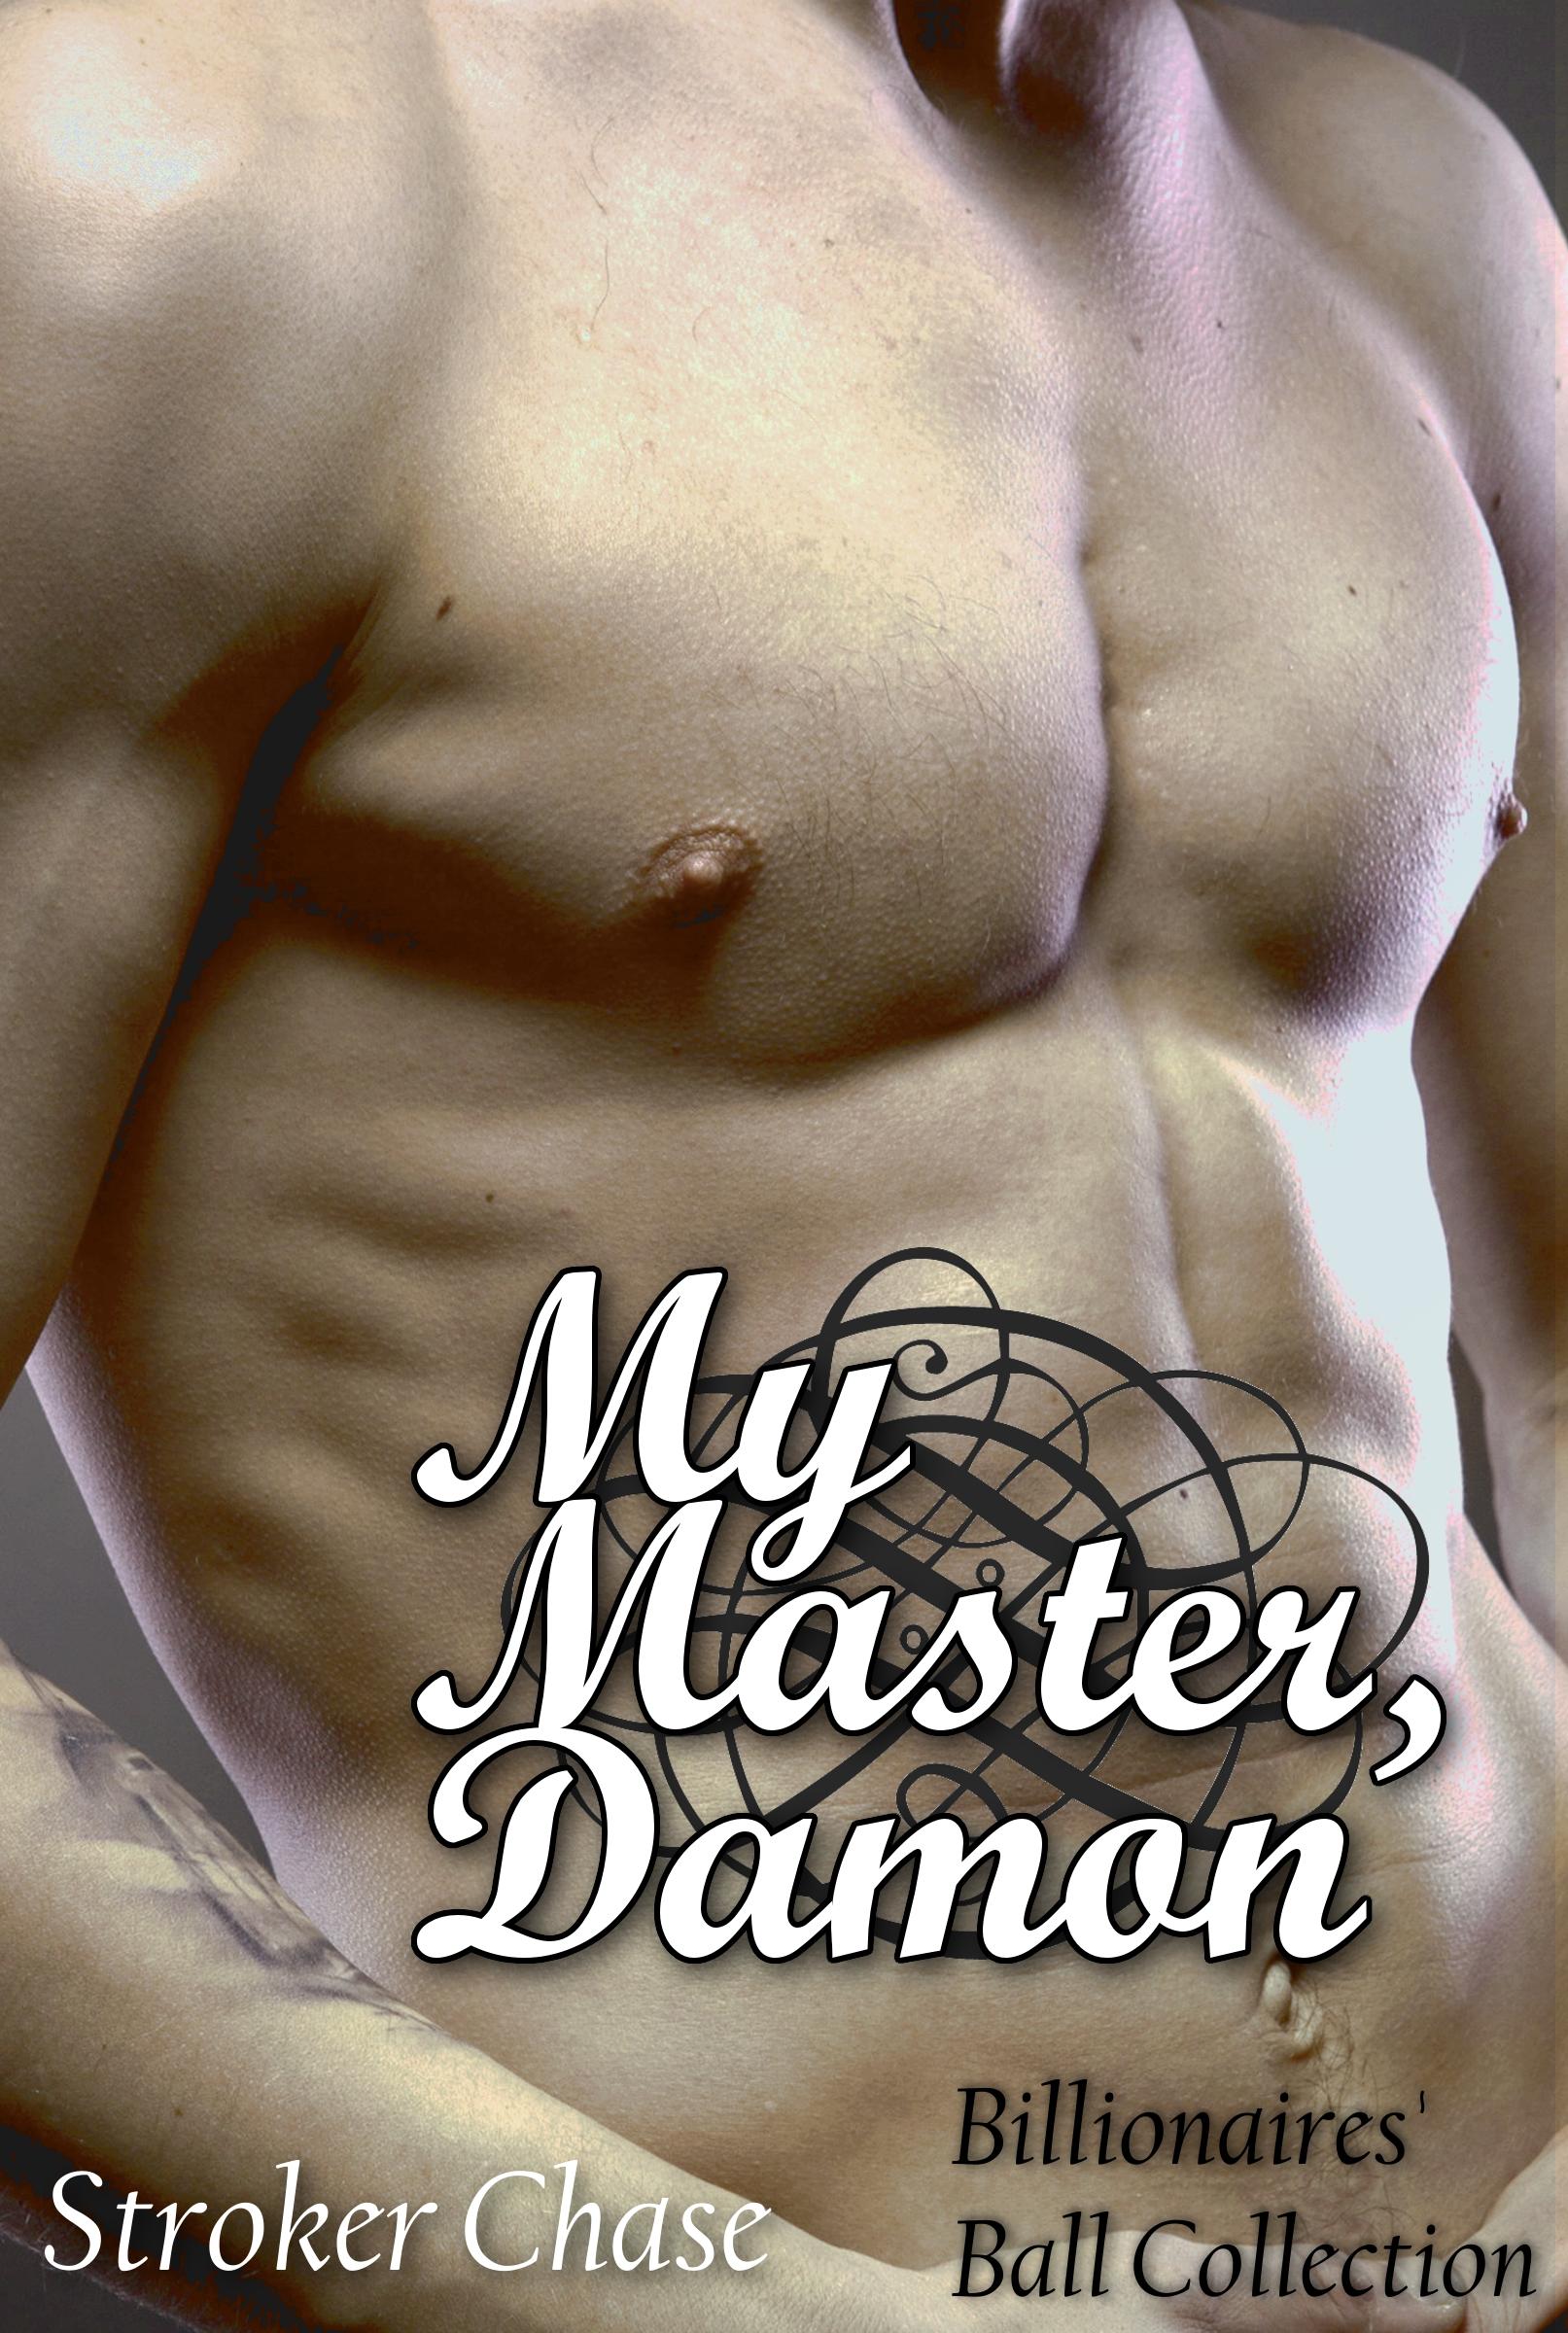 Black damon erotic stories adult tube